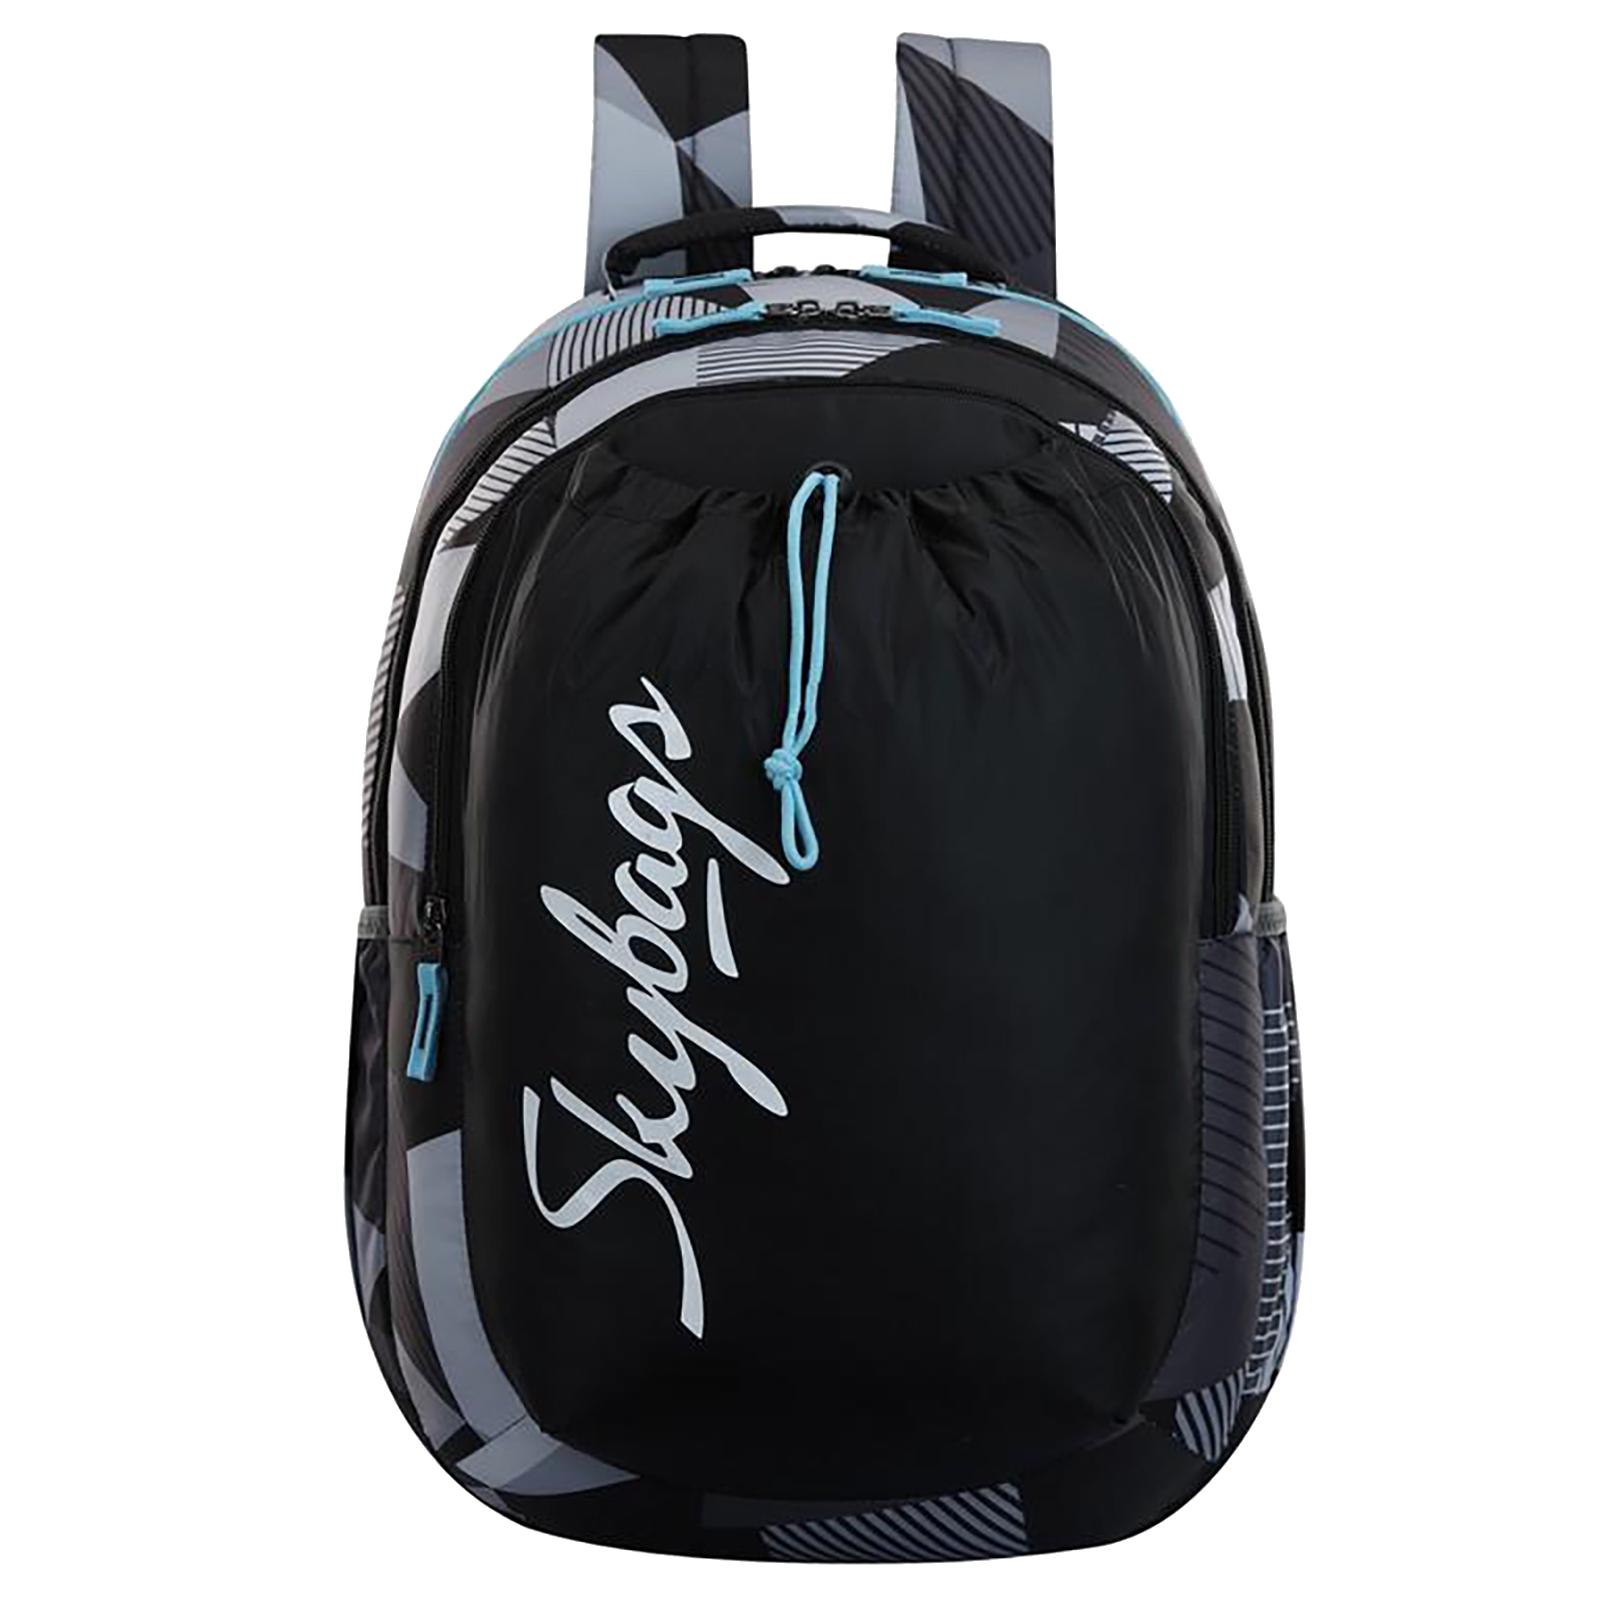 Sky Bags Astro Nxt 10 34 Litres Mini Gucci Backpack (Rain Cover, BPASN10BLK, Black)_1